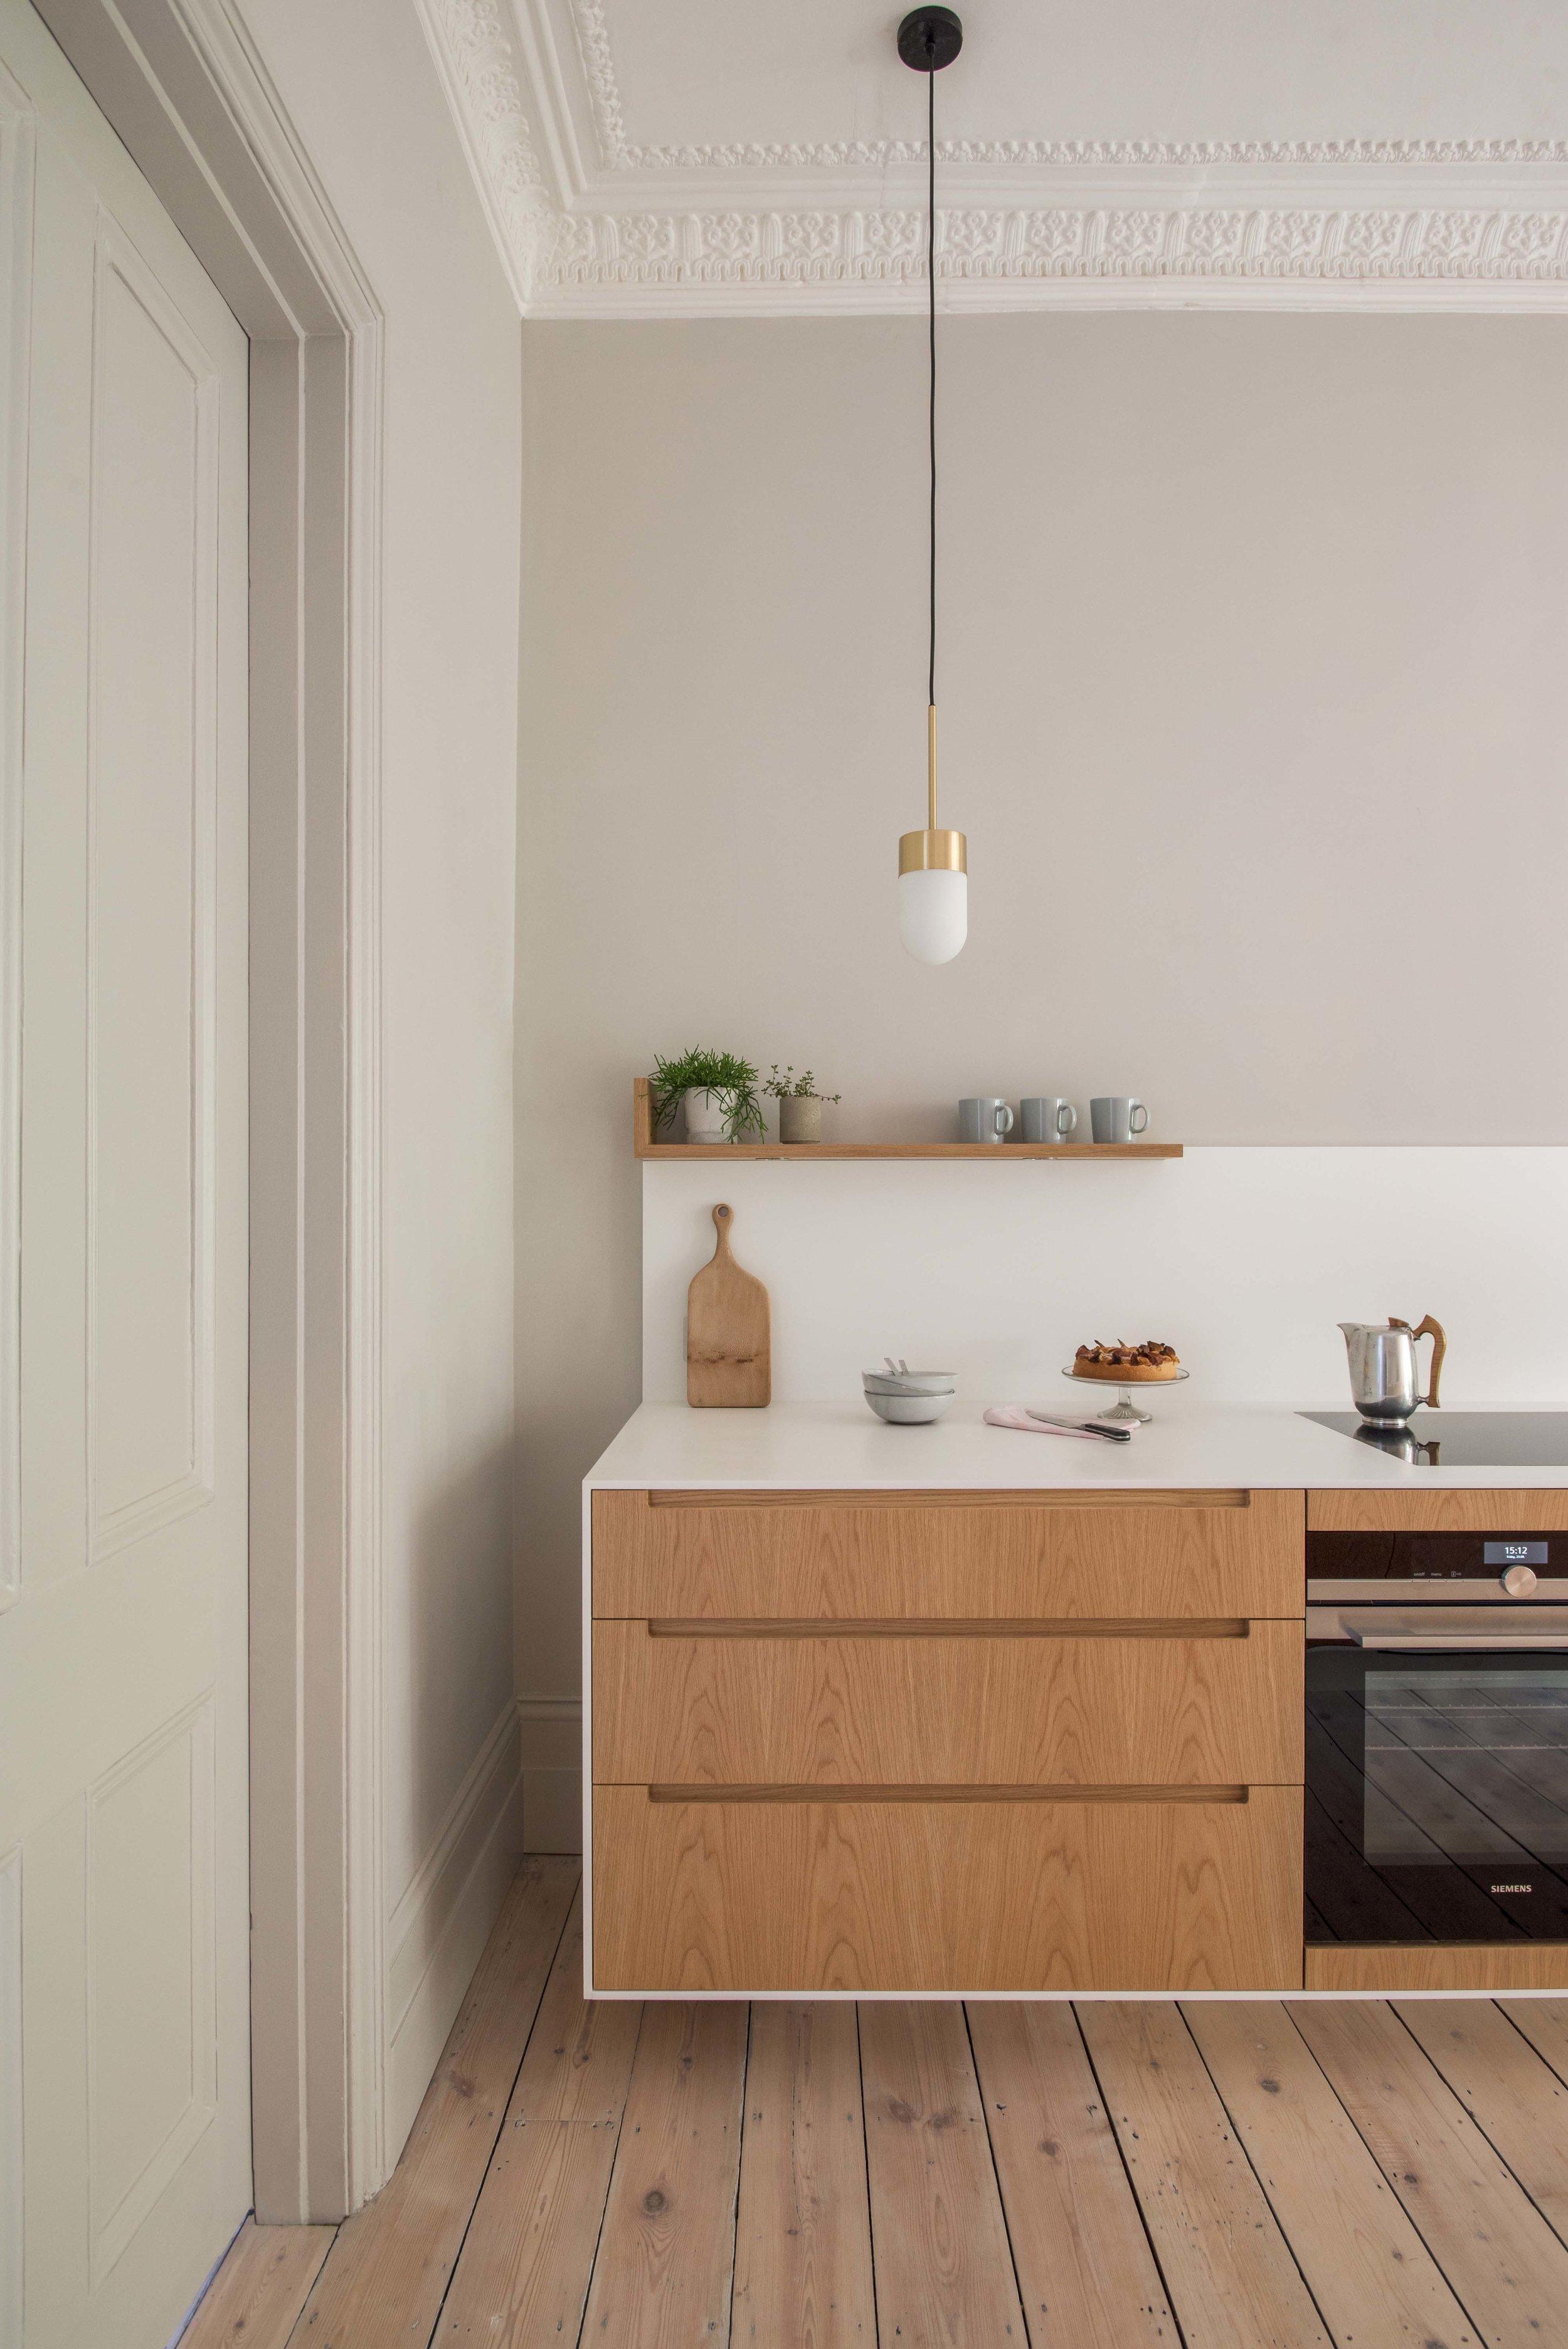 JT new Kitchen Edits HR (14 of 28).jpg